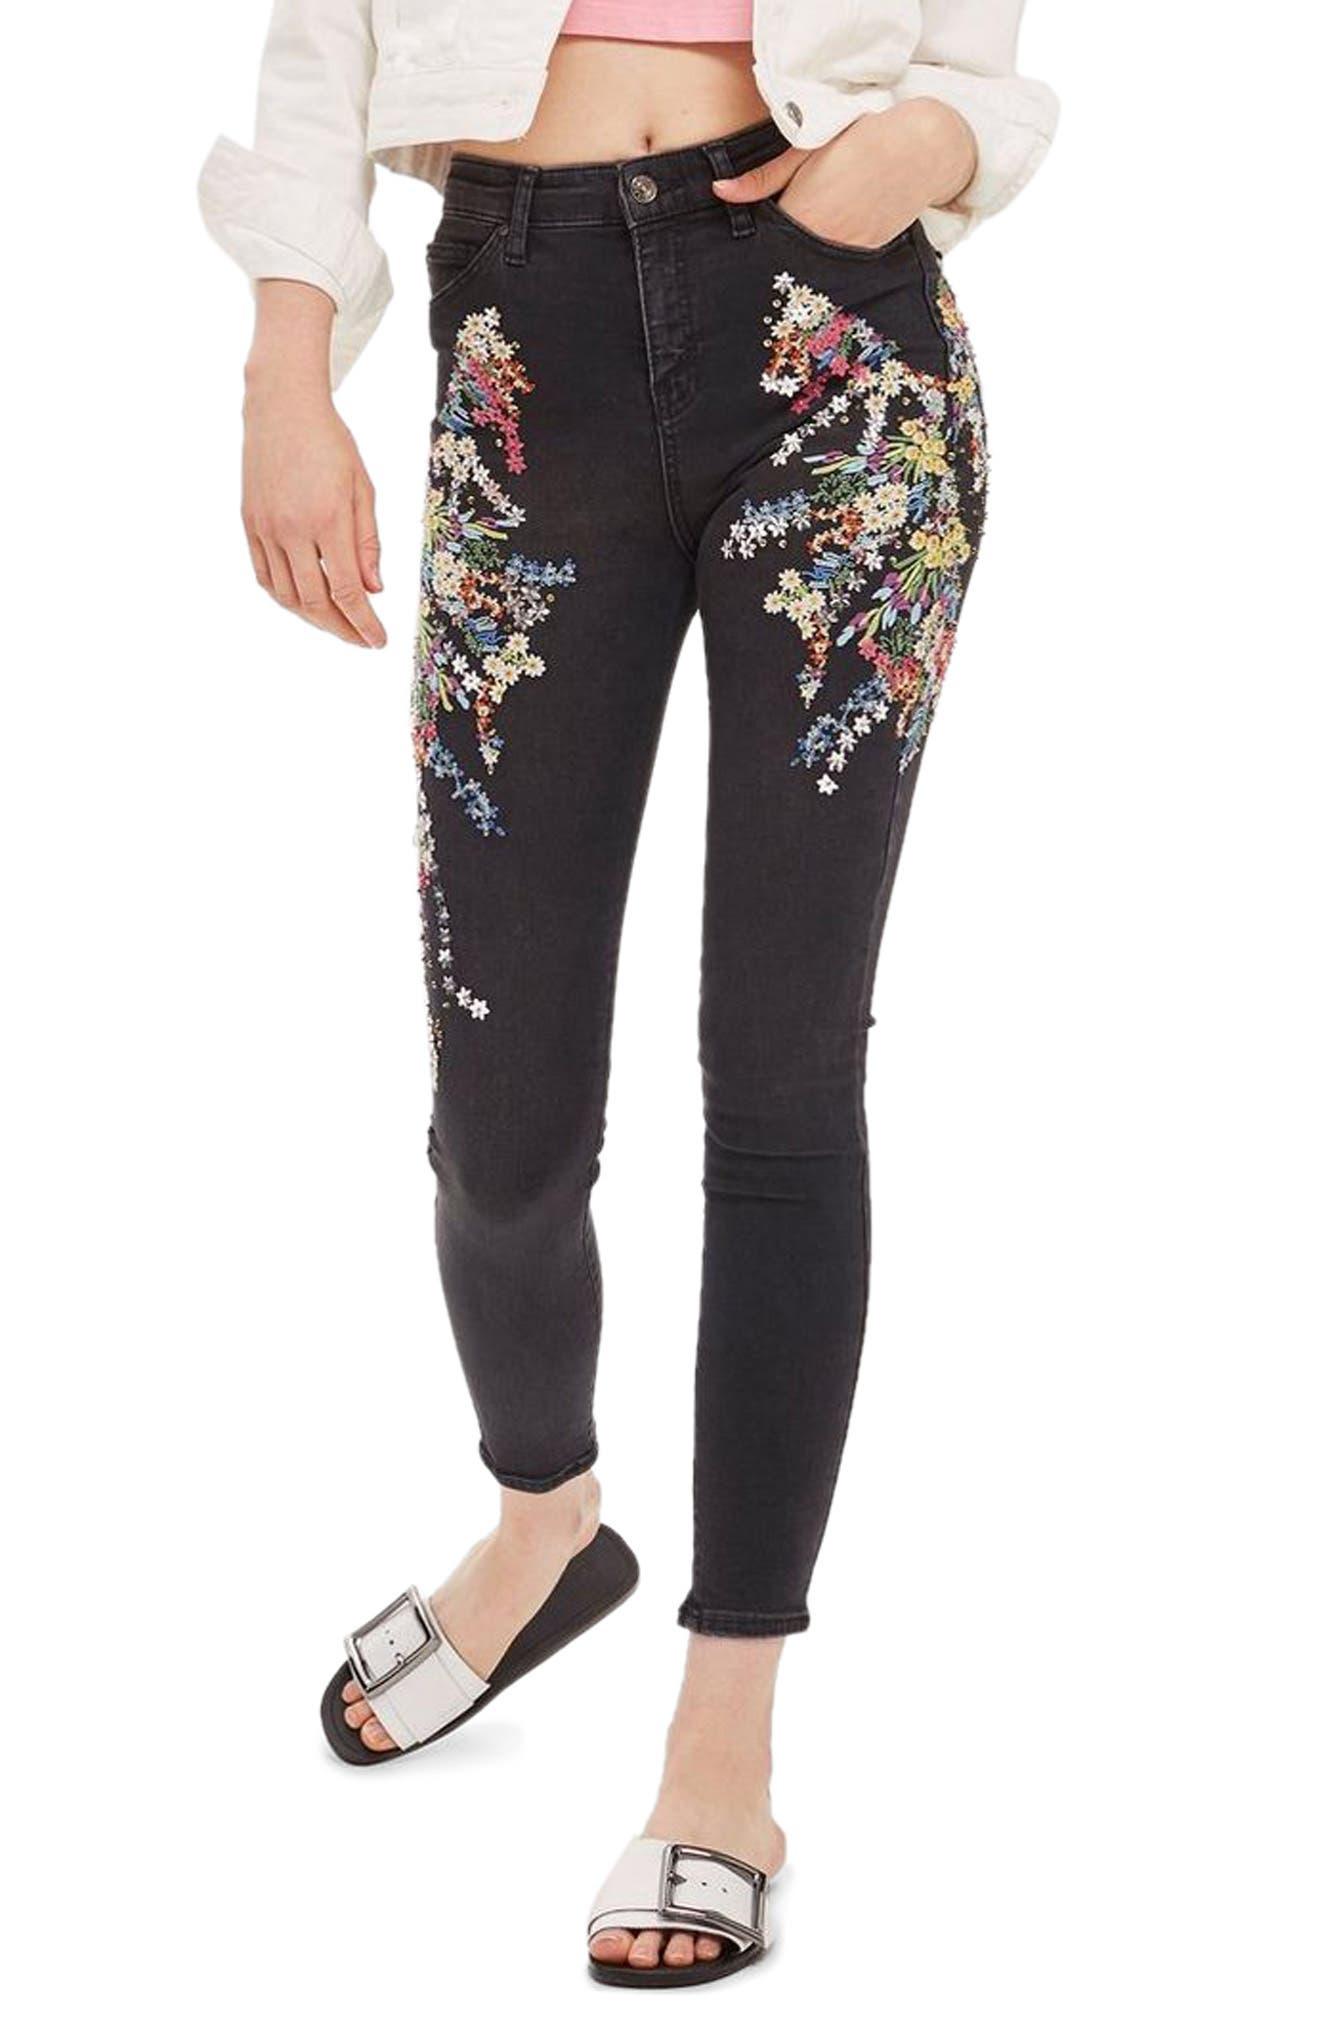 MOTO Jamie Ditsy Embellished Jeans,                         Main,                         color, Black Multi